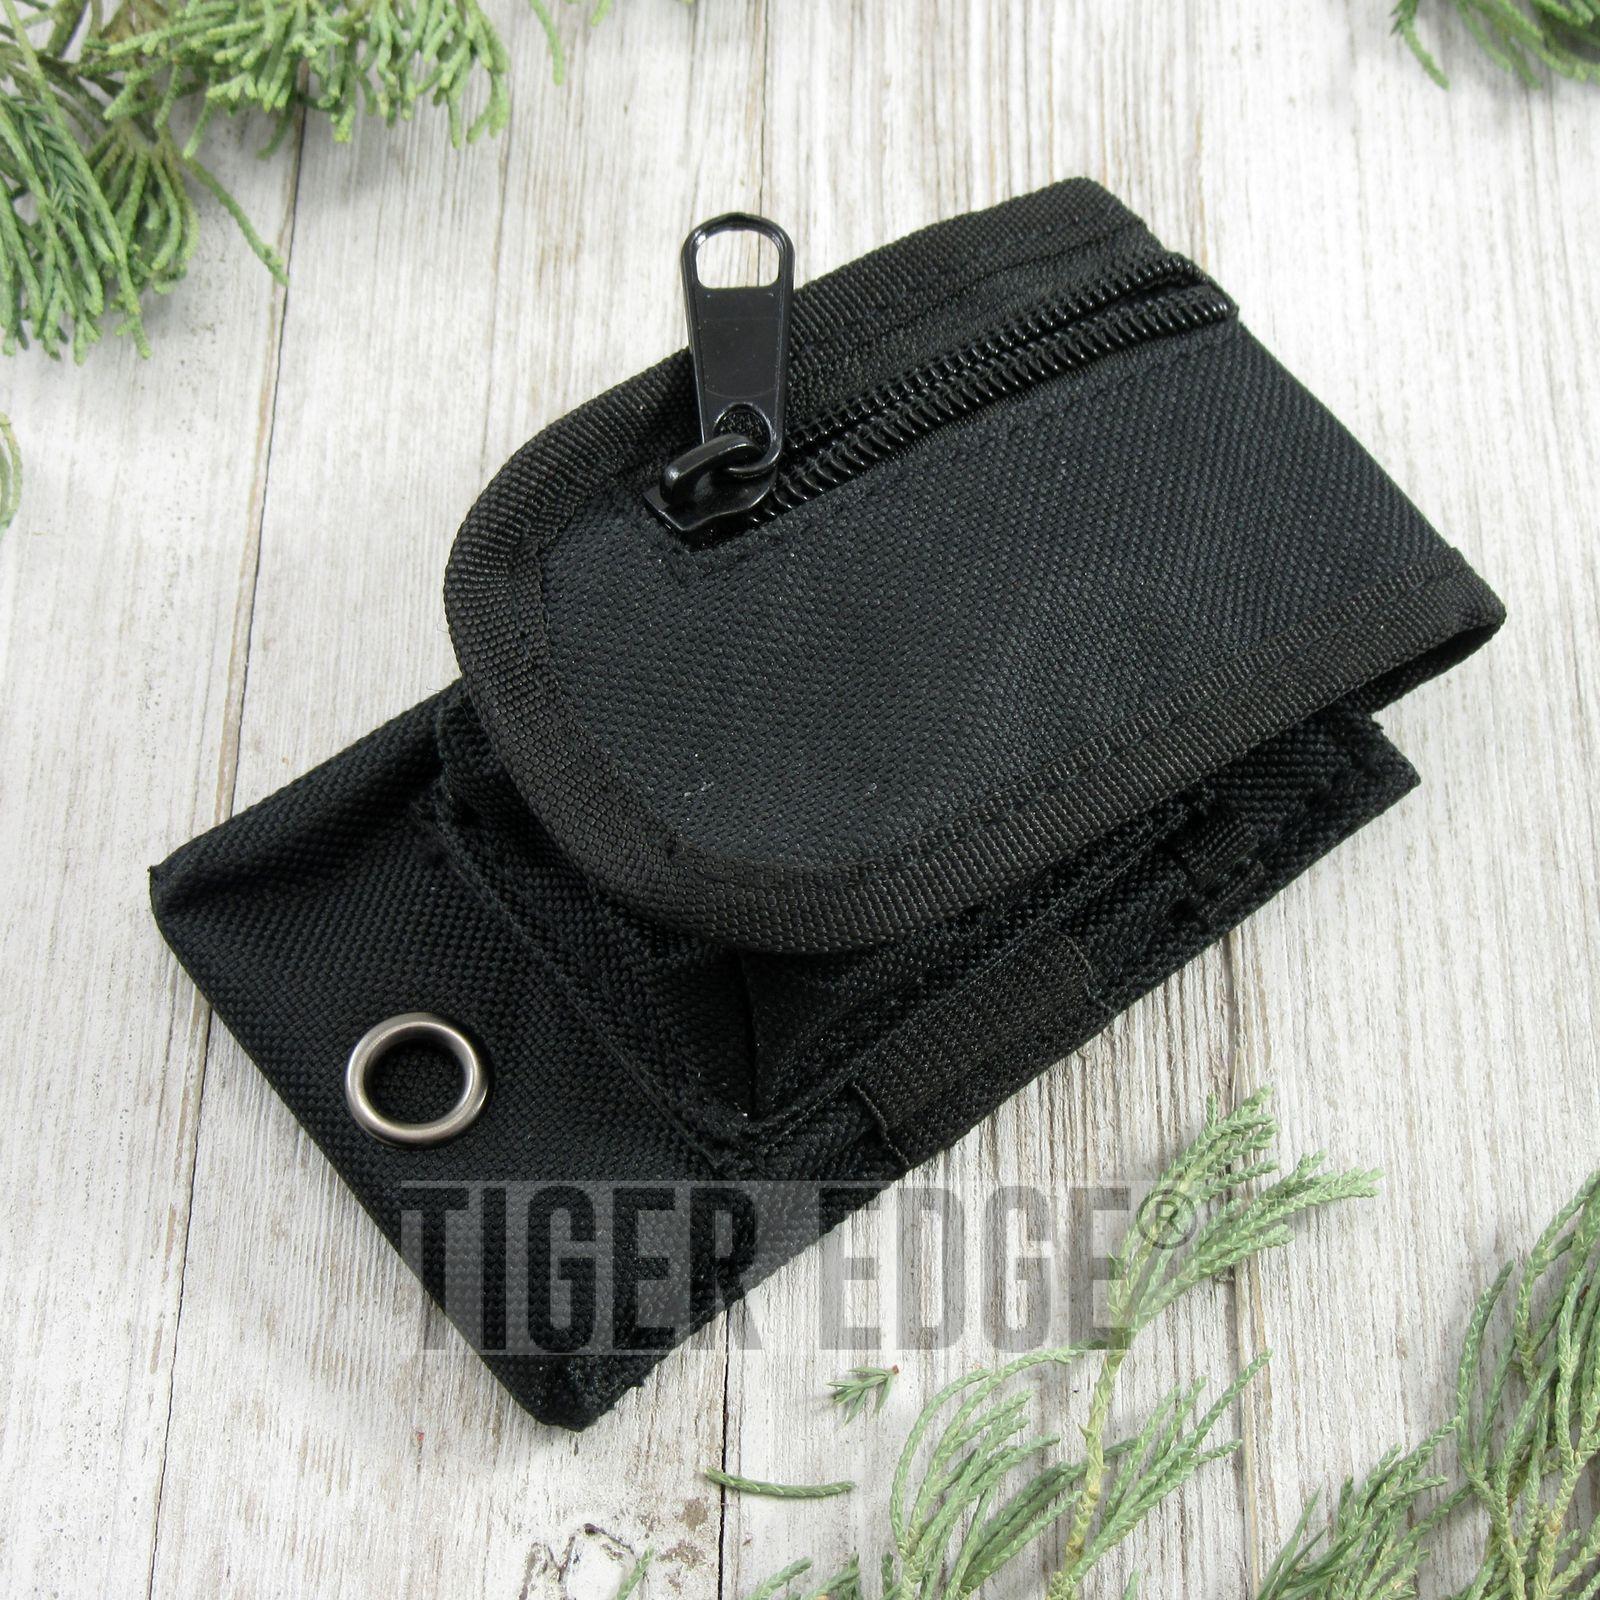 Folding Knife Sheath | Black Nylon Tactical Belt Pouch - For Folders Up To 3.5